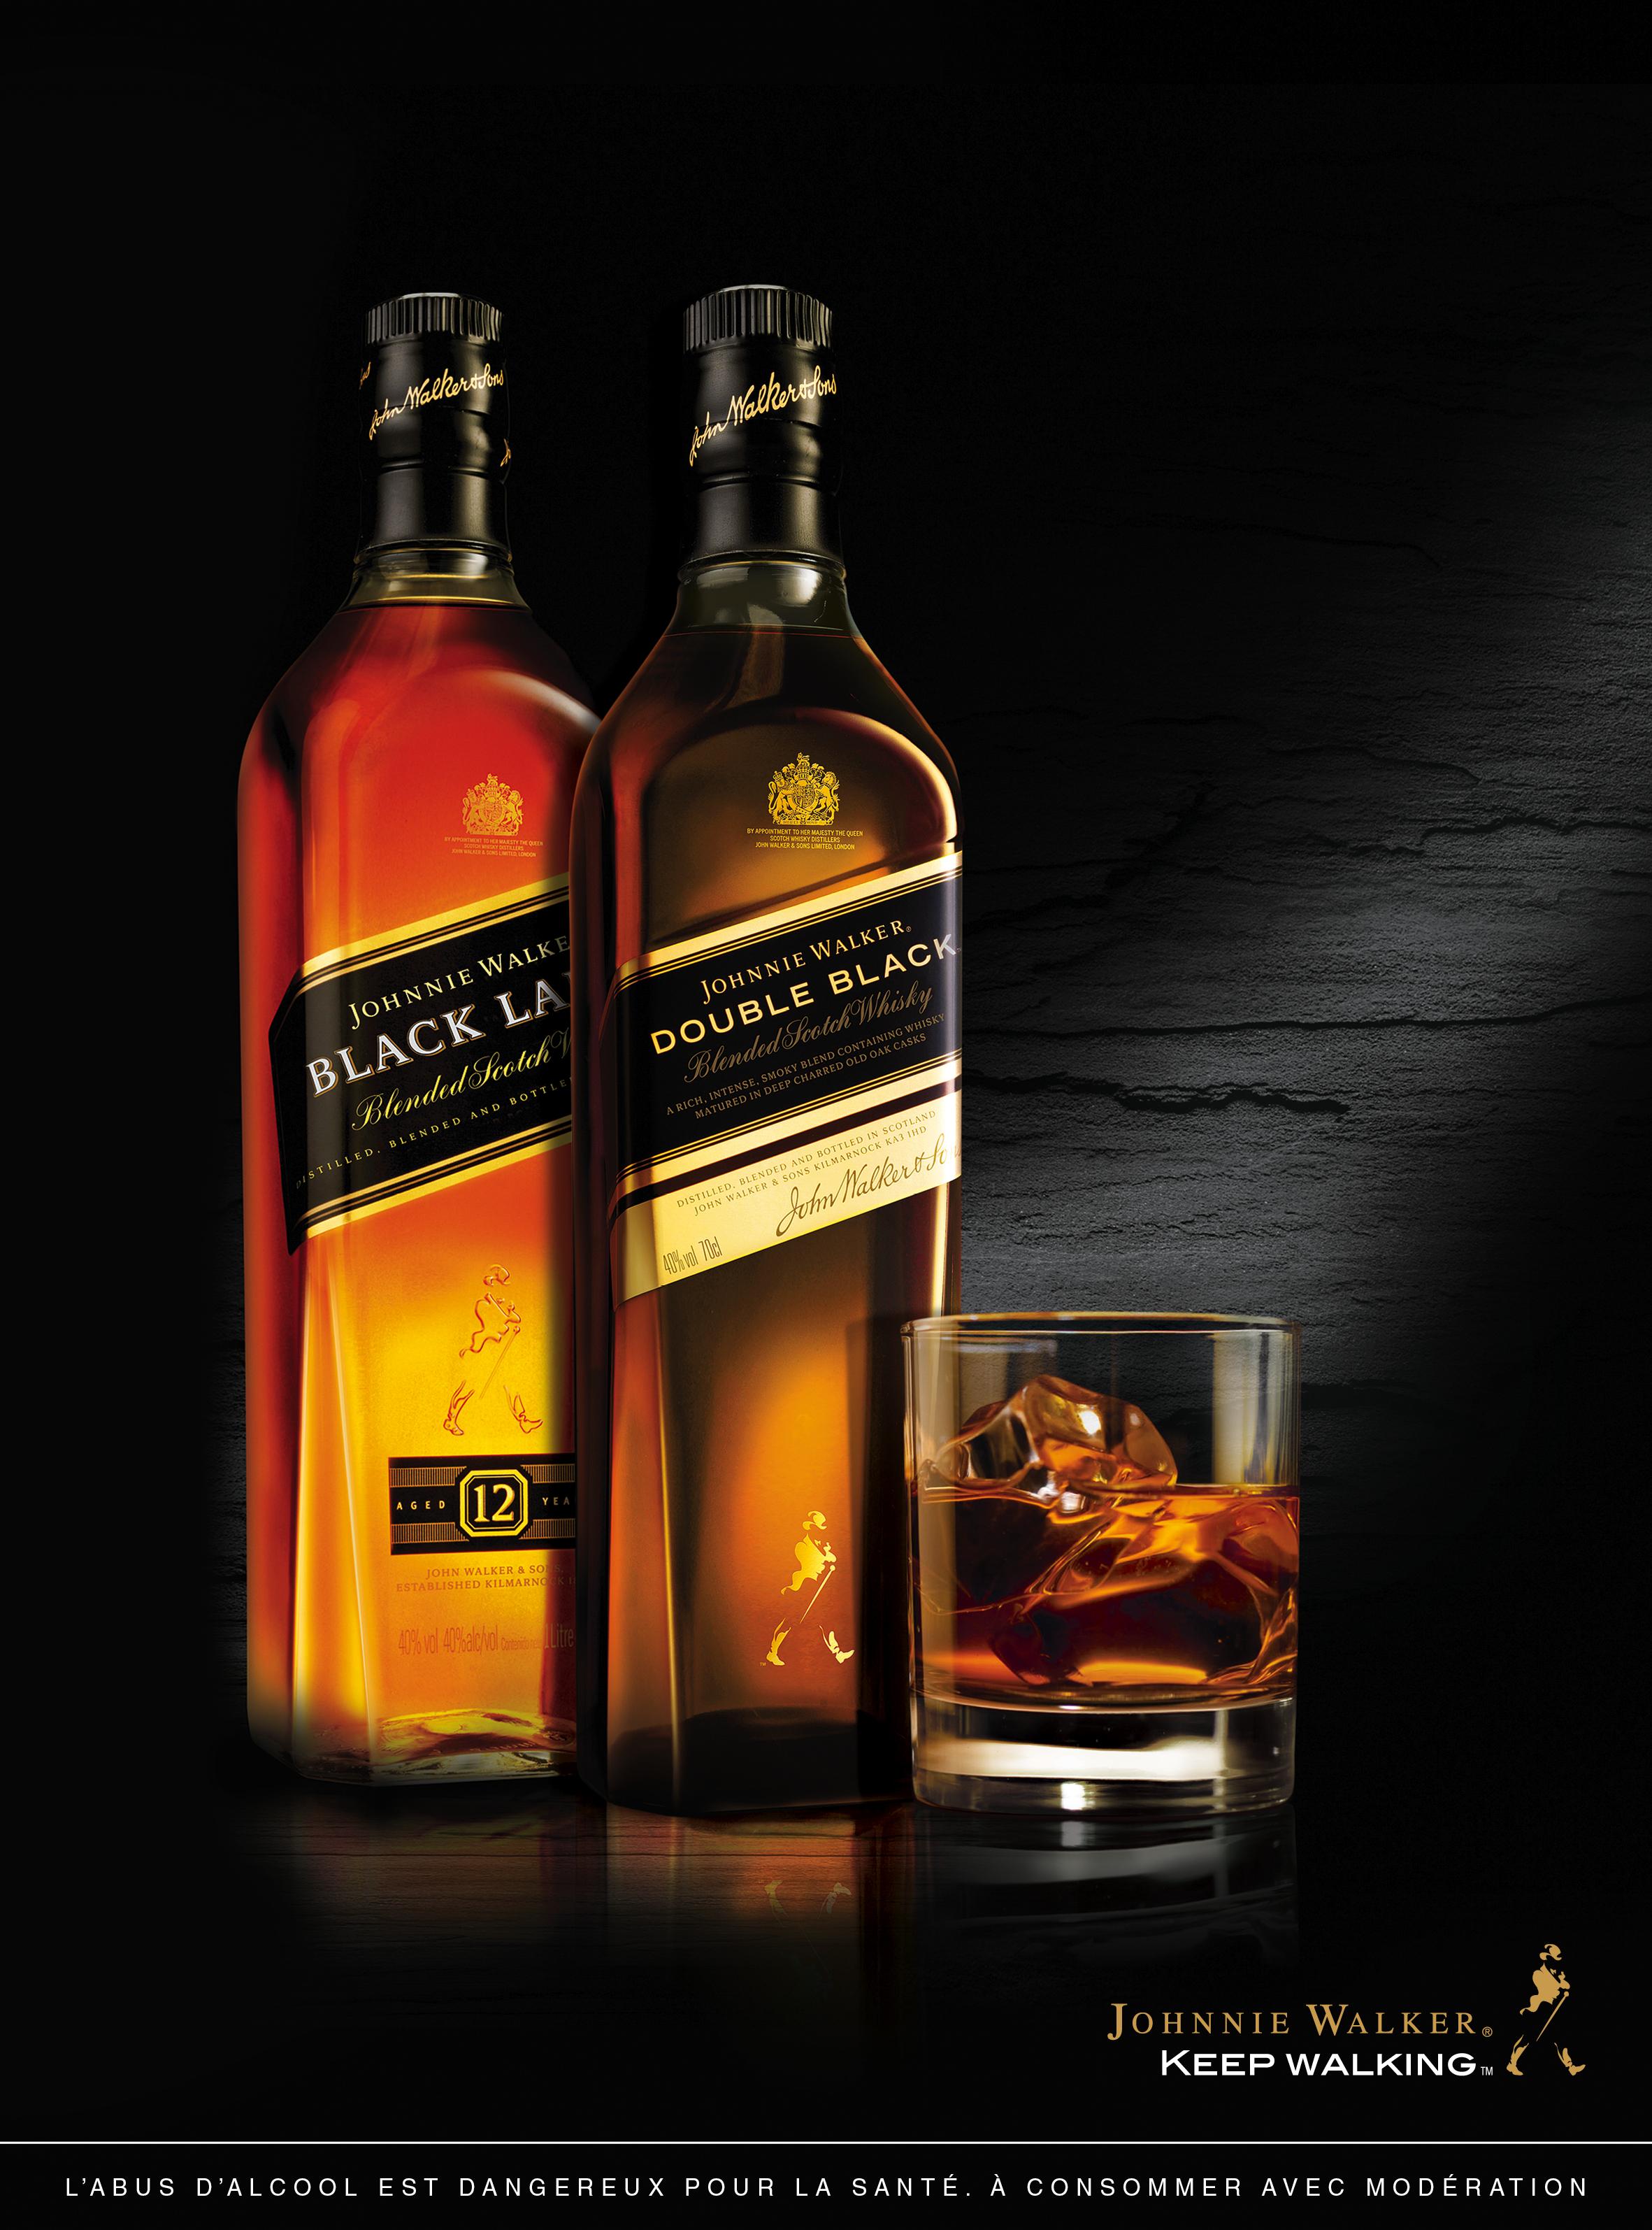 Johnnie-Walker-Publicite-Alcool-Whisky-Presse